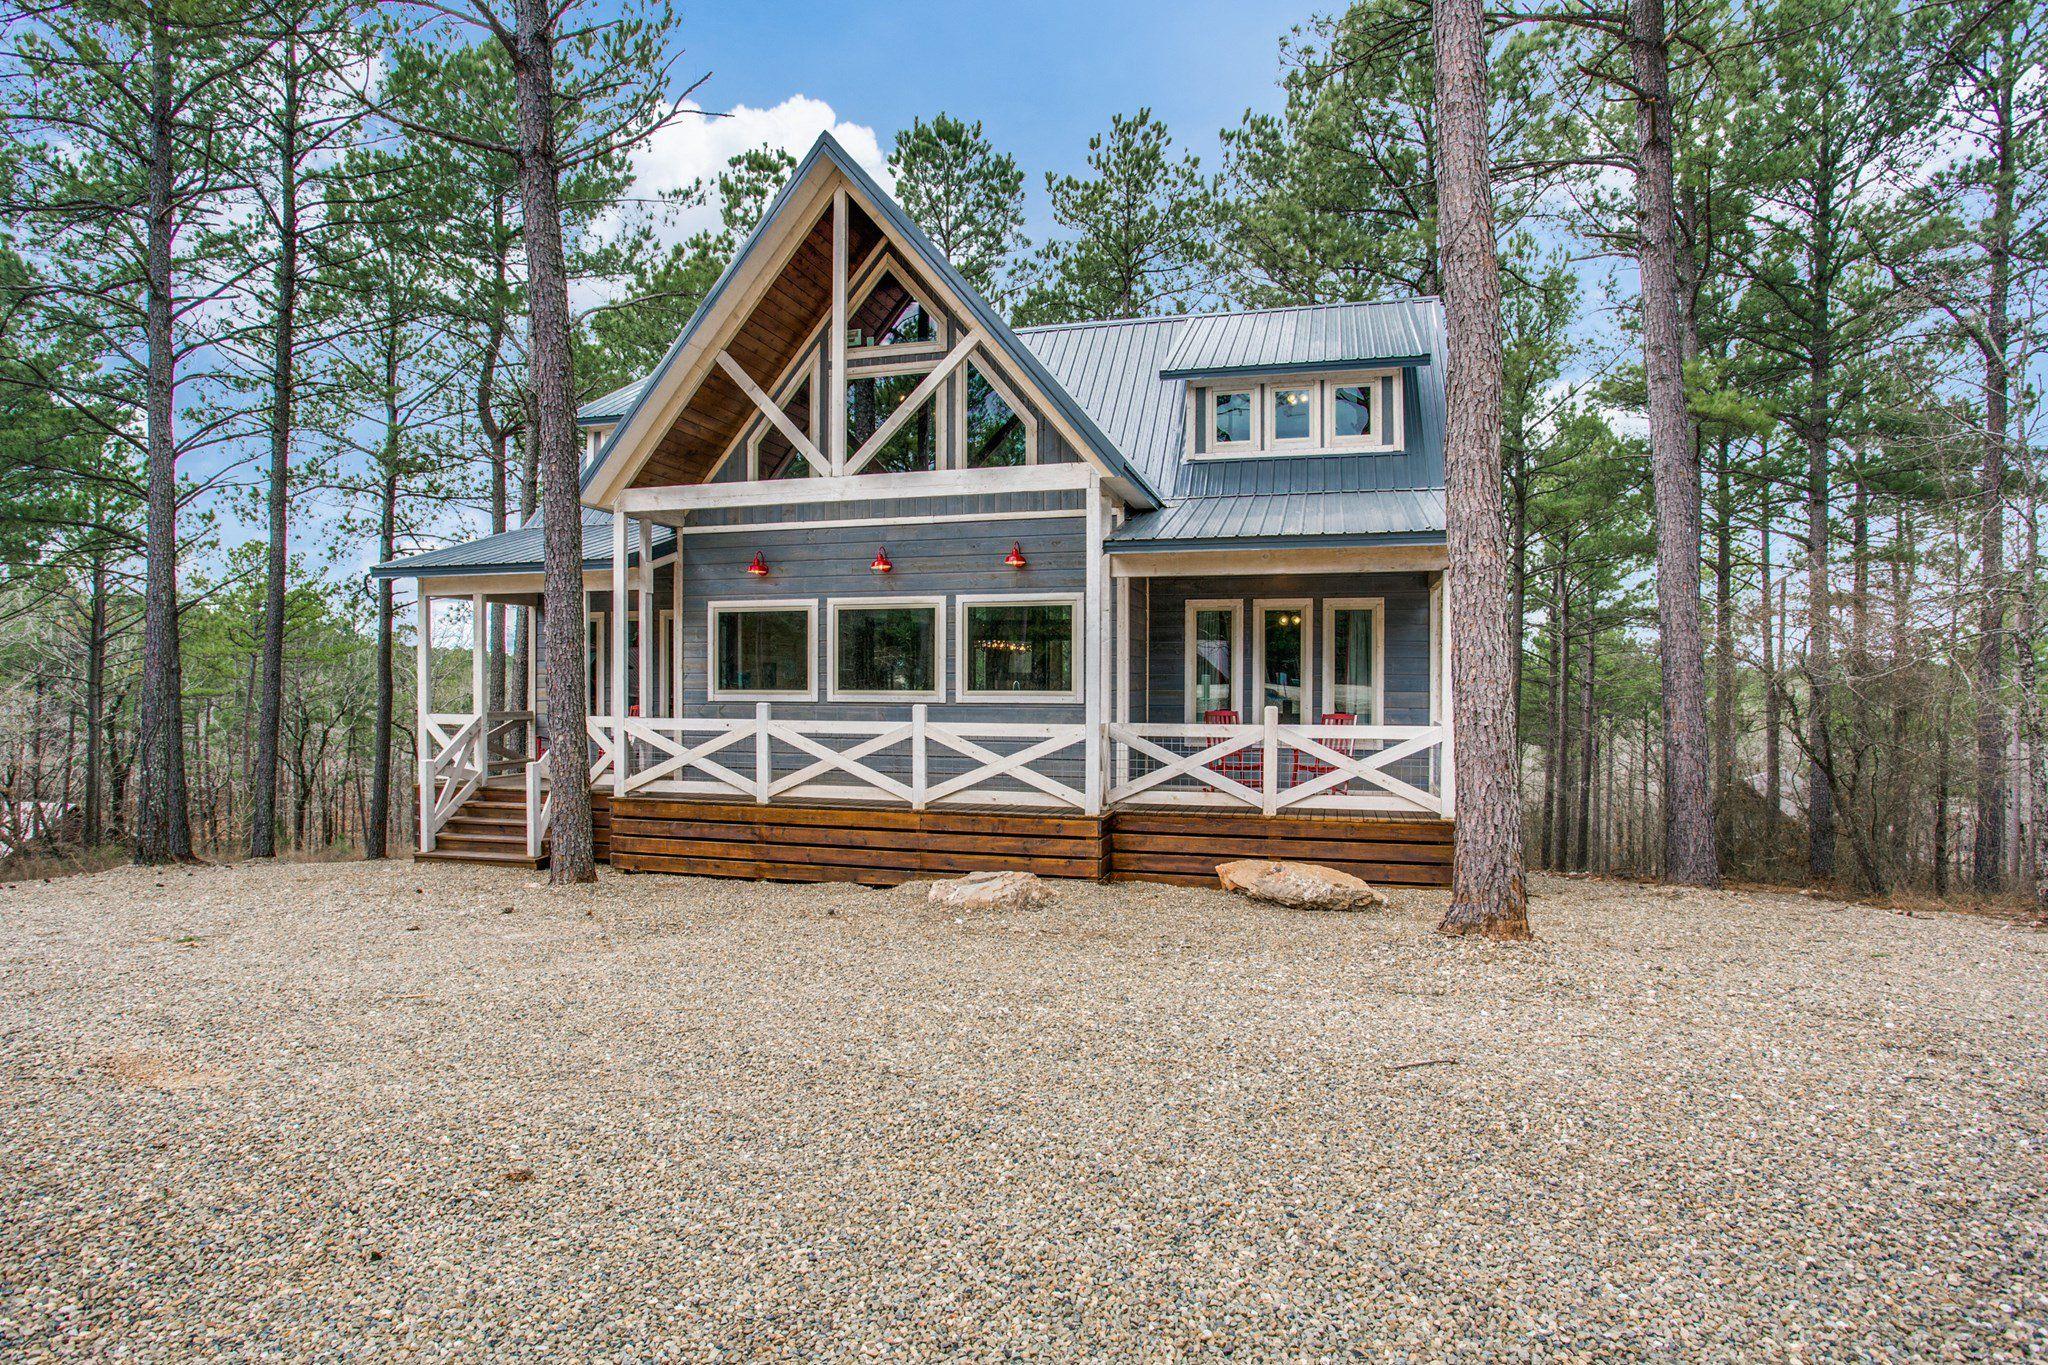 Vacation Cabin in Broken Bow, OK Cabin, White cabin